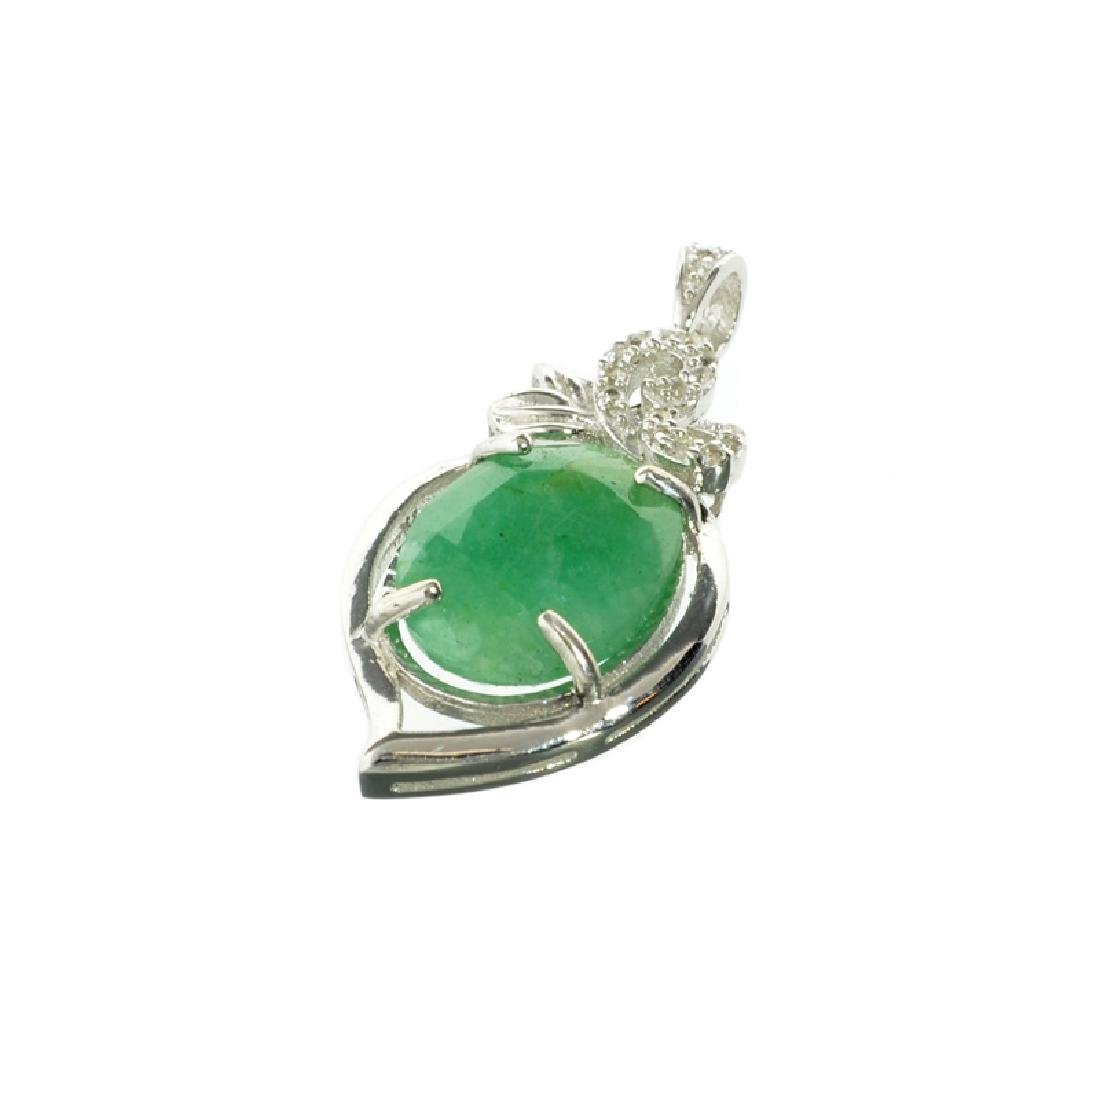 APP: 0.6k Fine Jewelry 7.00CT Oval Cut Green Beryl And